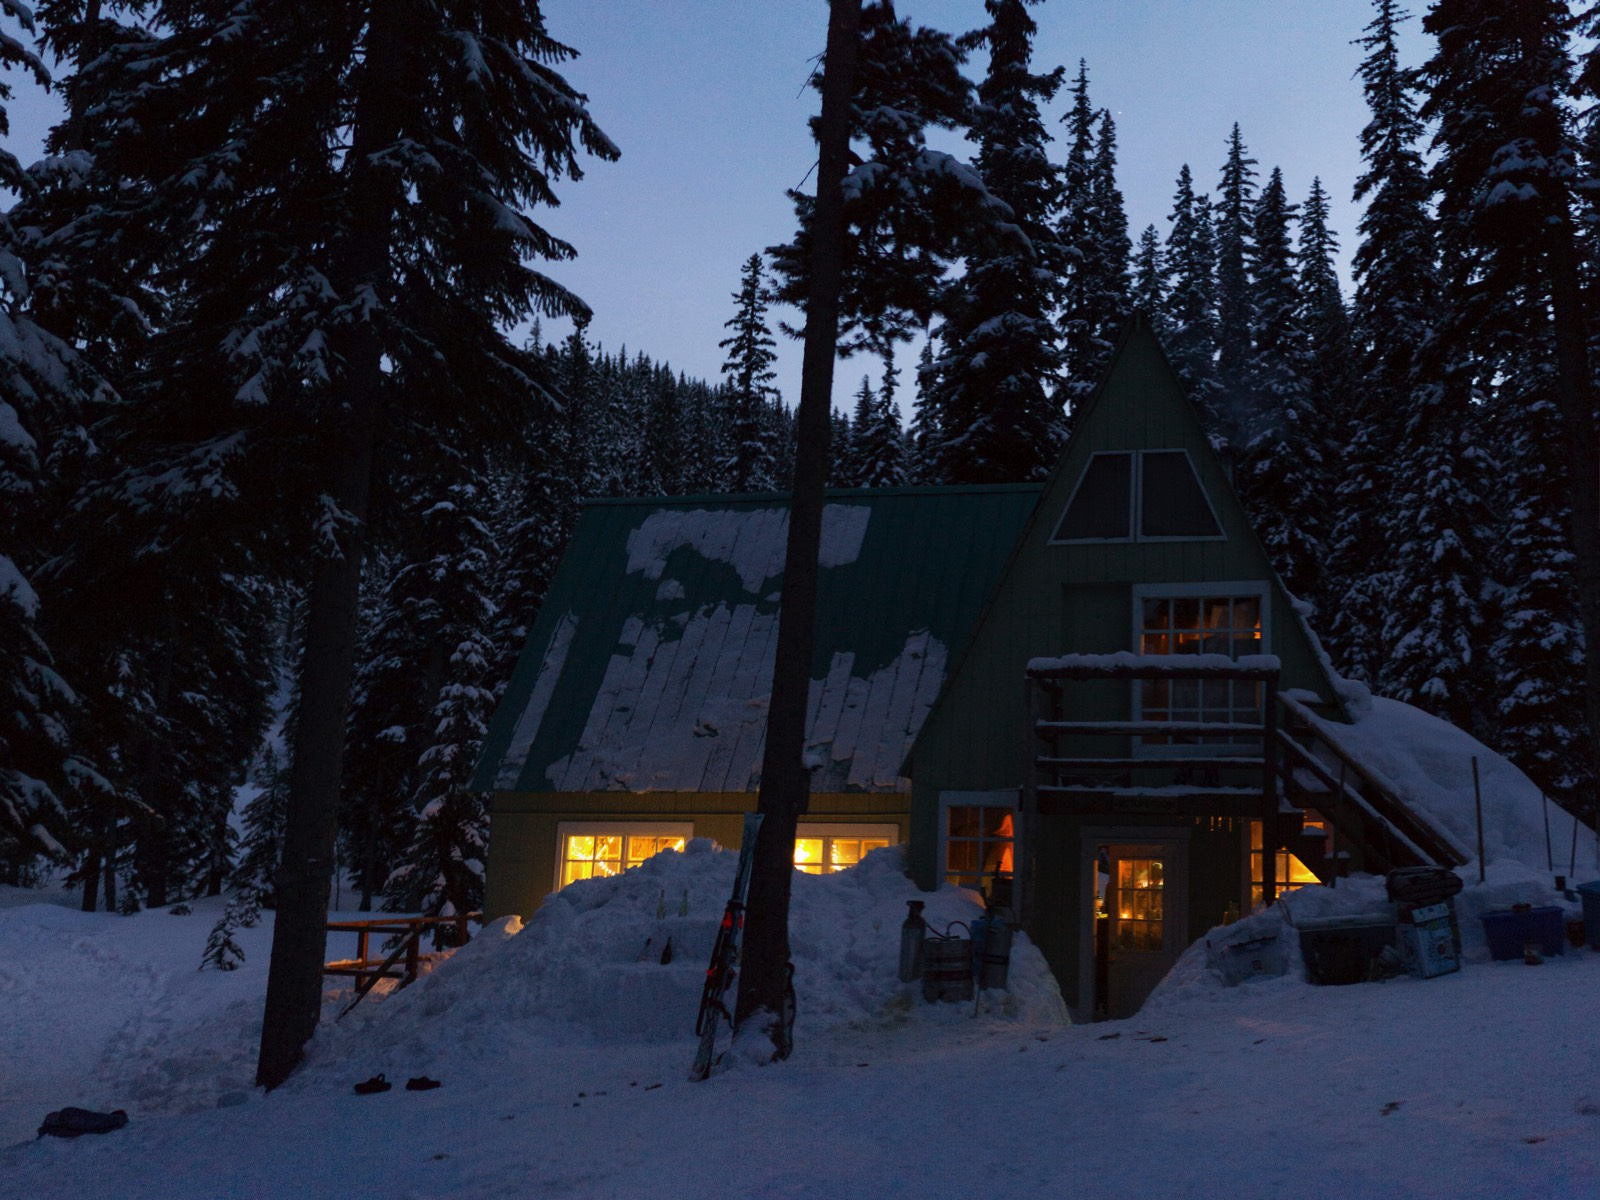 alpine-lakes-high-camp-winter-wedding-90 ALPINE LAKES HIGH CAMP WEDDING